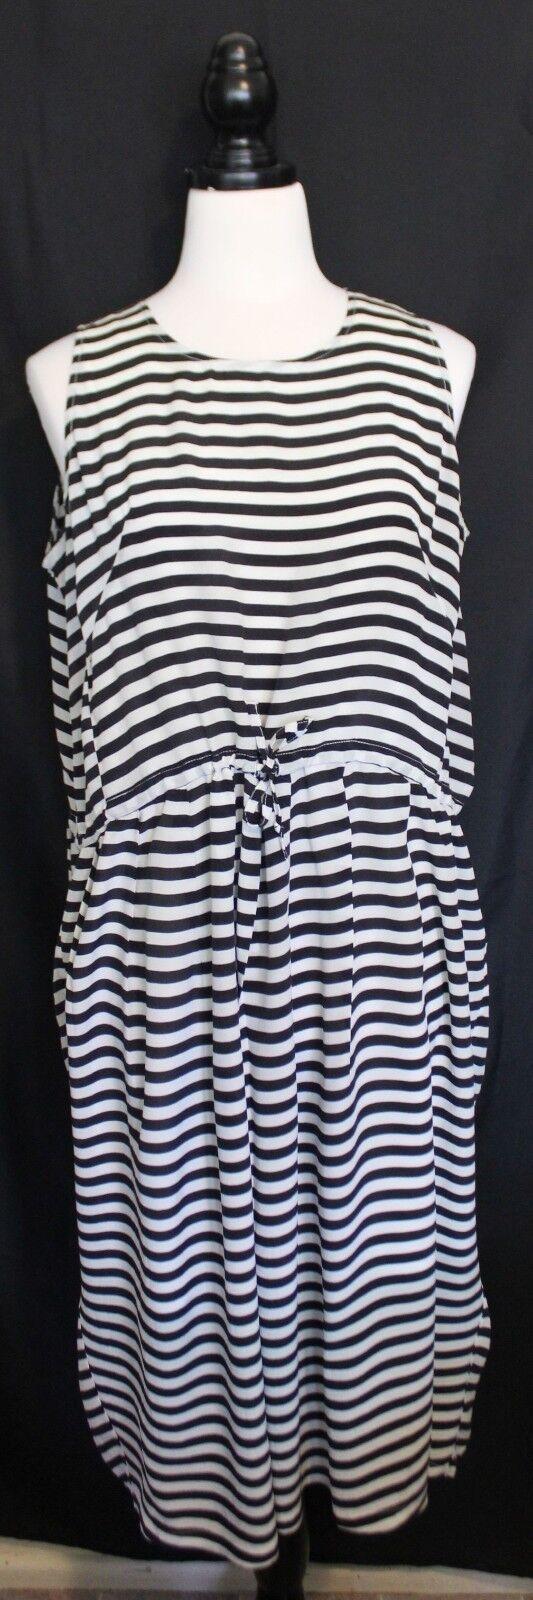 Búl BUL  Melbourne Design schwarz Weiß Striped Silk Sleeveless Dress w Shift 10